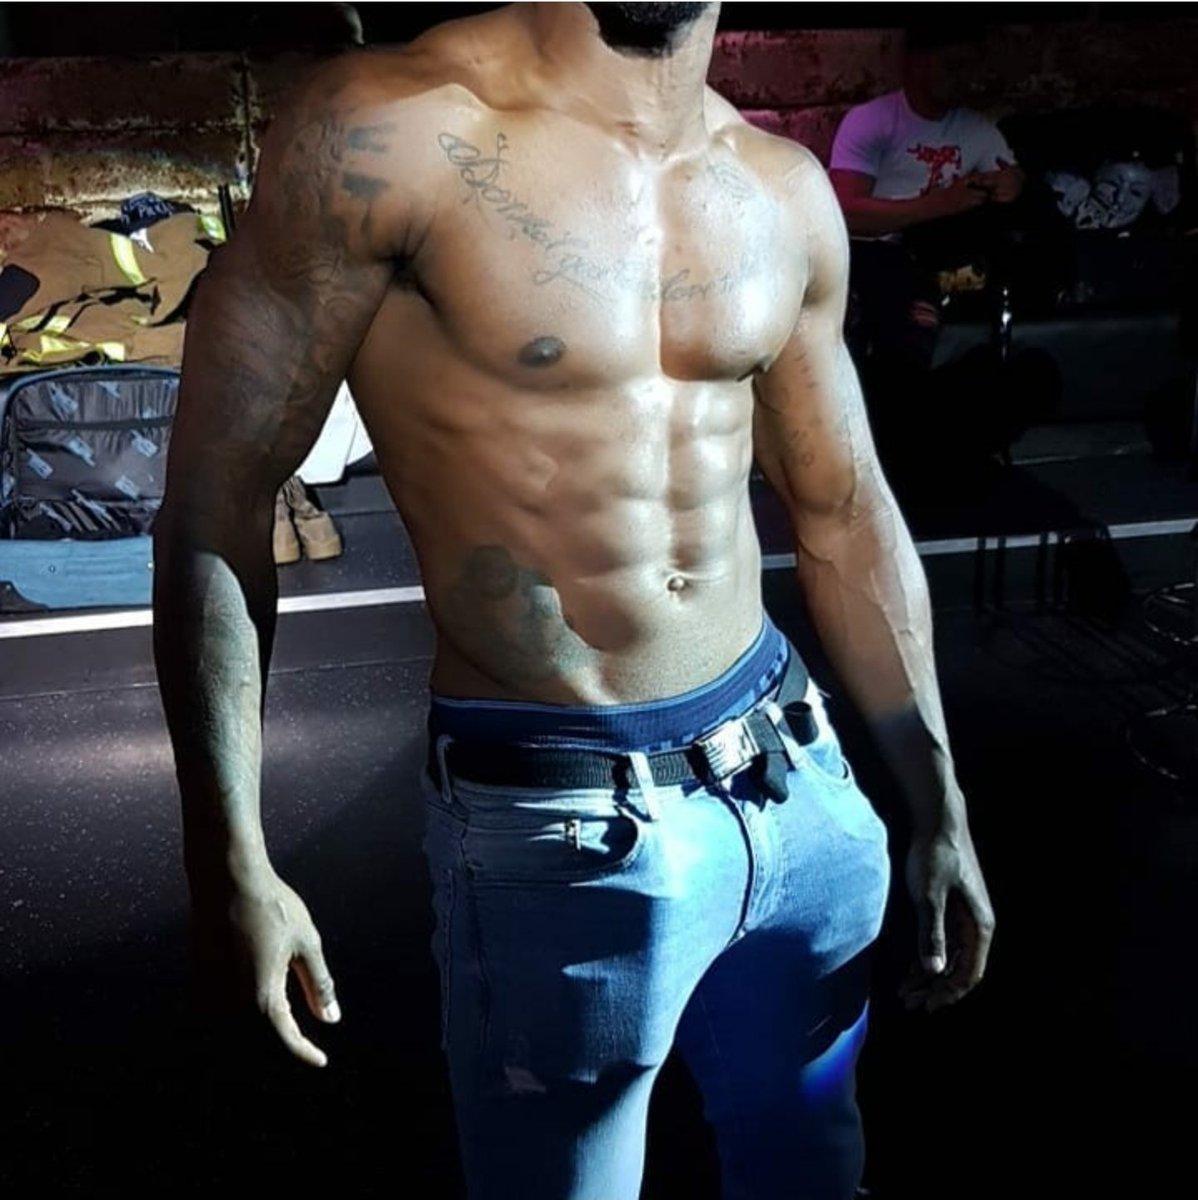 Ready to put on a show 😈 ⬇️ onlyfans.com/chocolatemix @SexyMenOnIy @Sexyfamousmen @hotnakedlads @stripp_muscle @ATMaleStrippers @atm4bbc @blackboysXXX @BlkStrippersLV @buldg @maletalentinc @Xxxfitnessmen @OF_MuscleModels @Addicted2Muscl @ApolloPromoter @Hotukmen @FitFamousMales